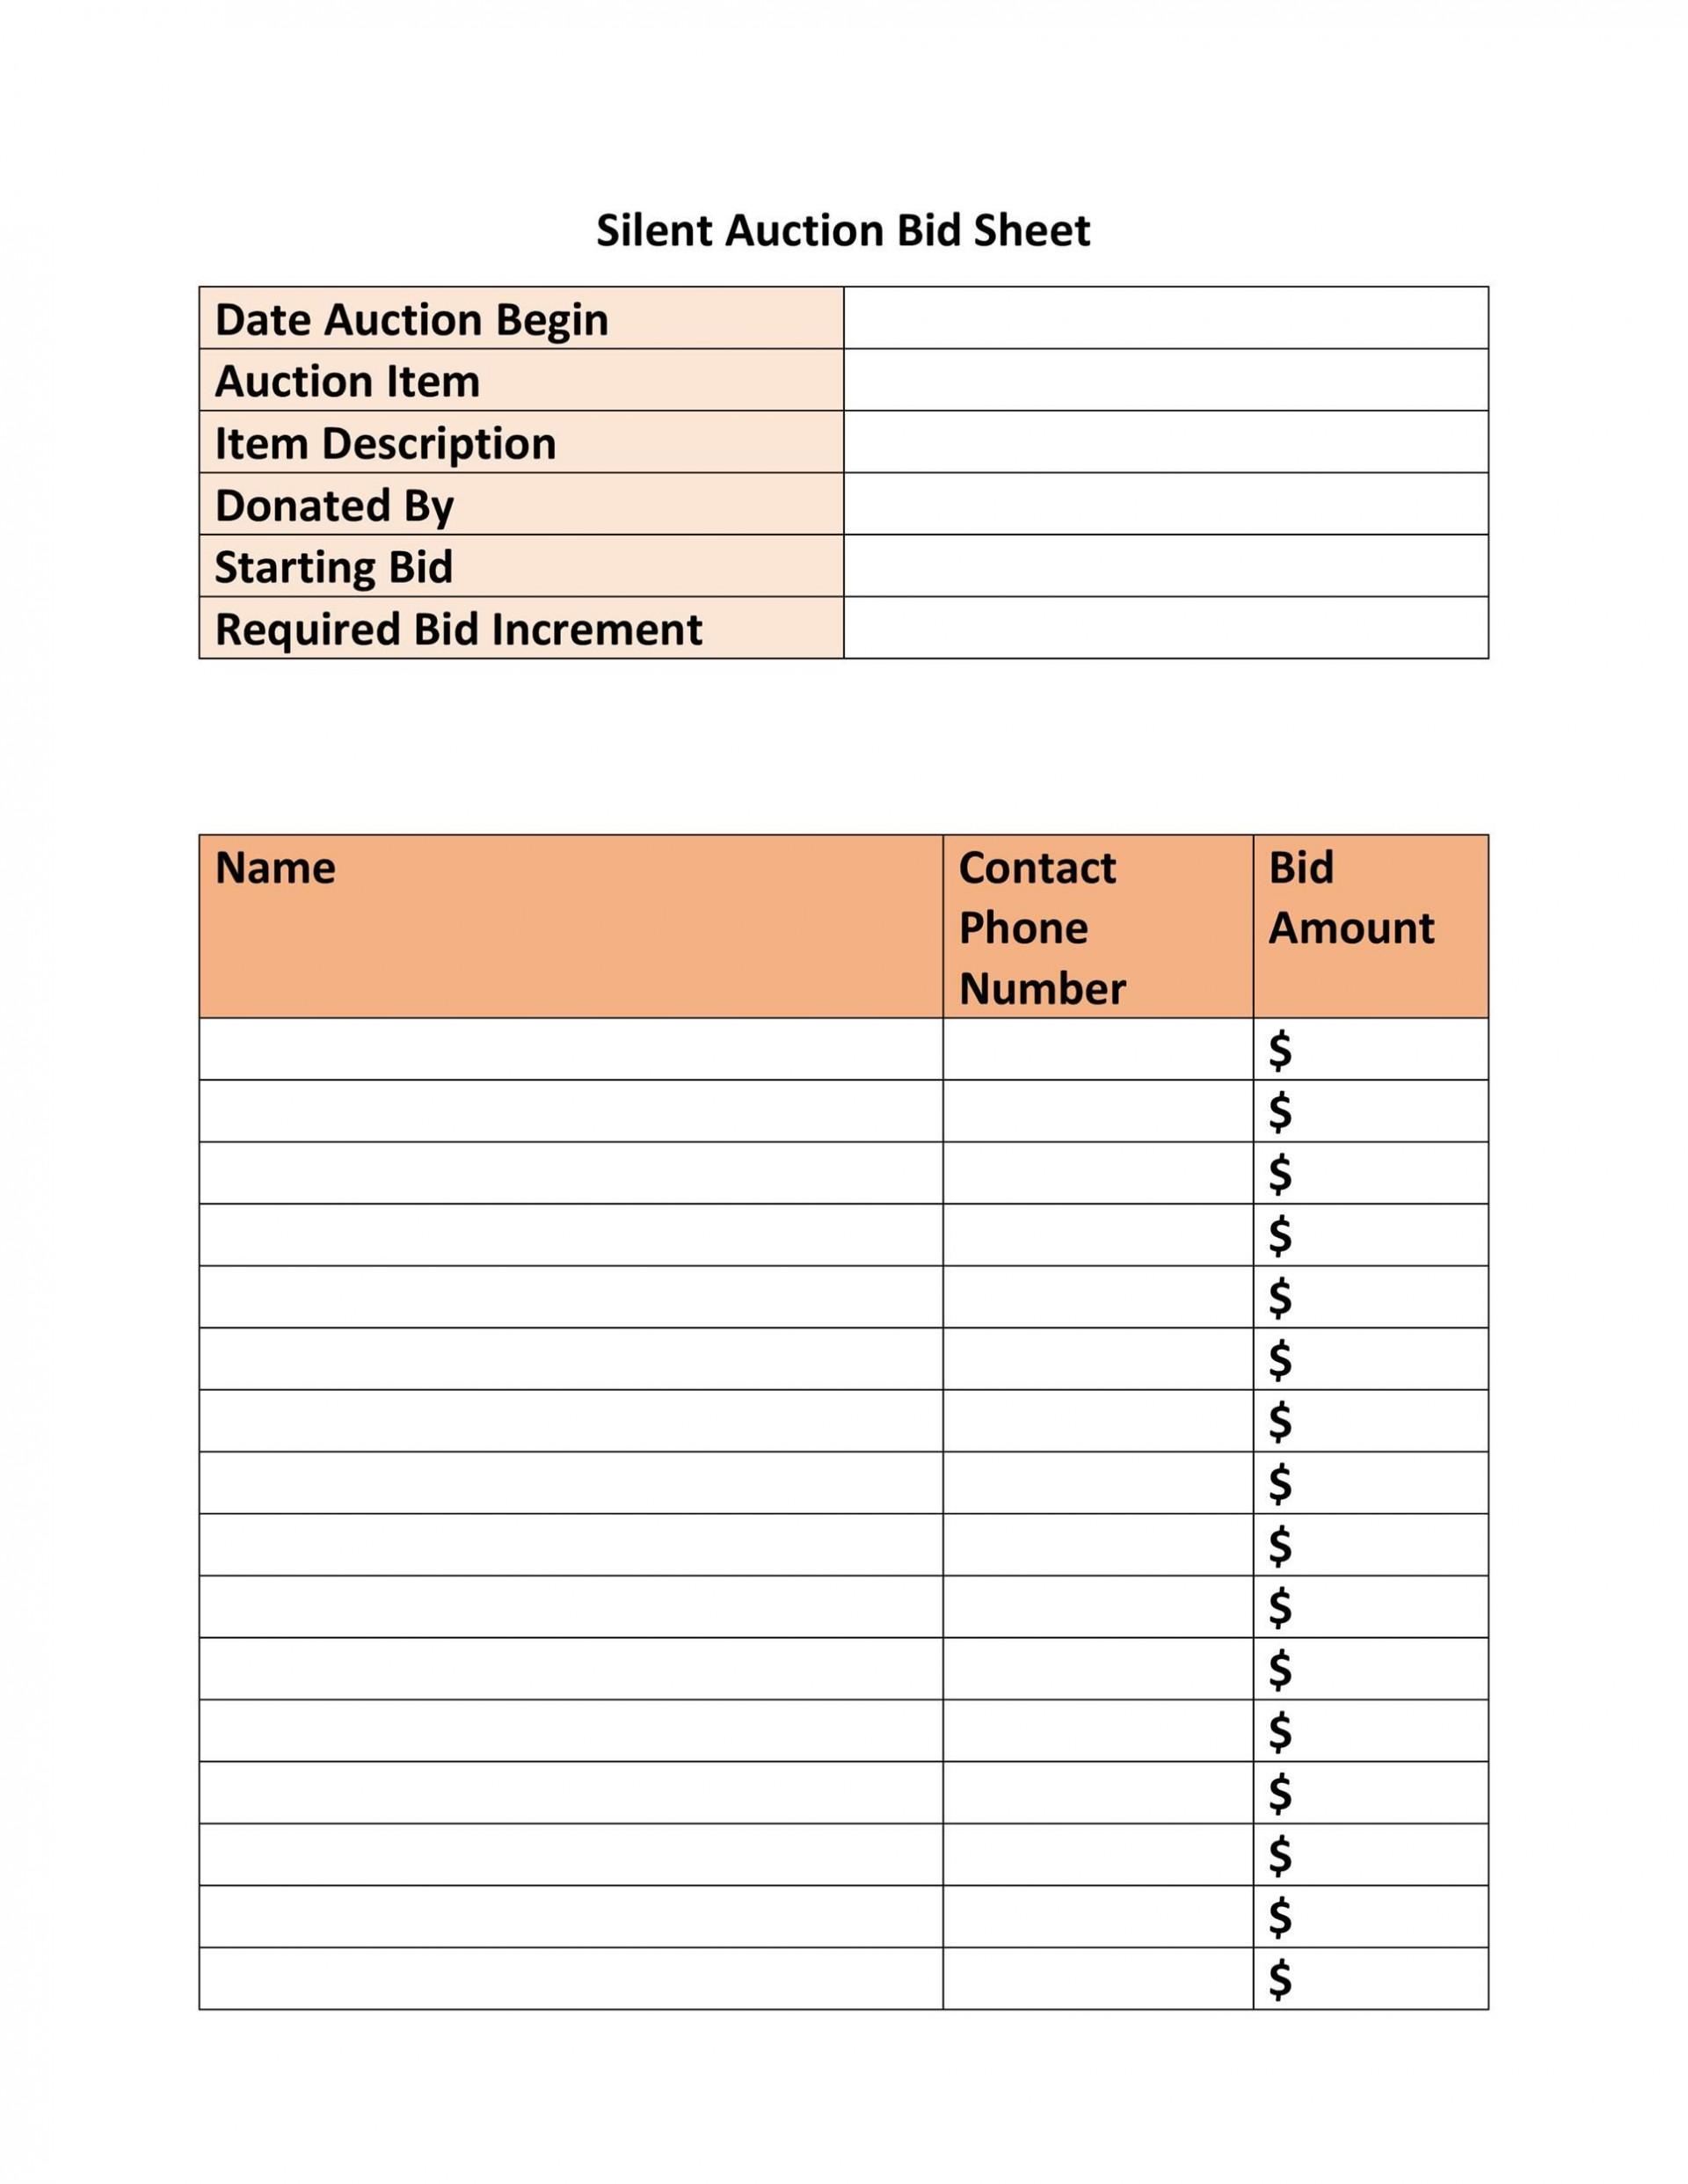 005 Rare Silent Auction Bid Sheet Template Free Inspiration  Pdf Download1920